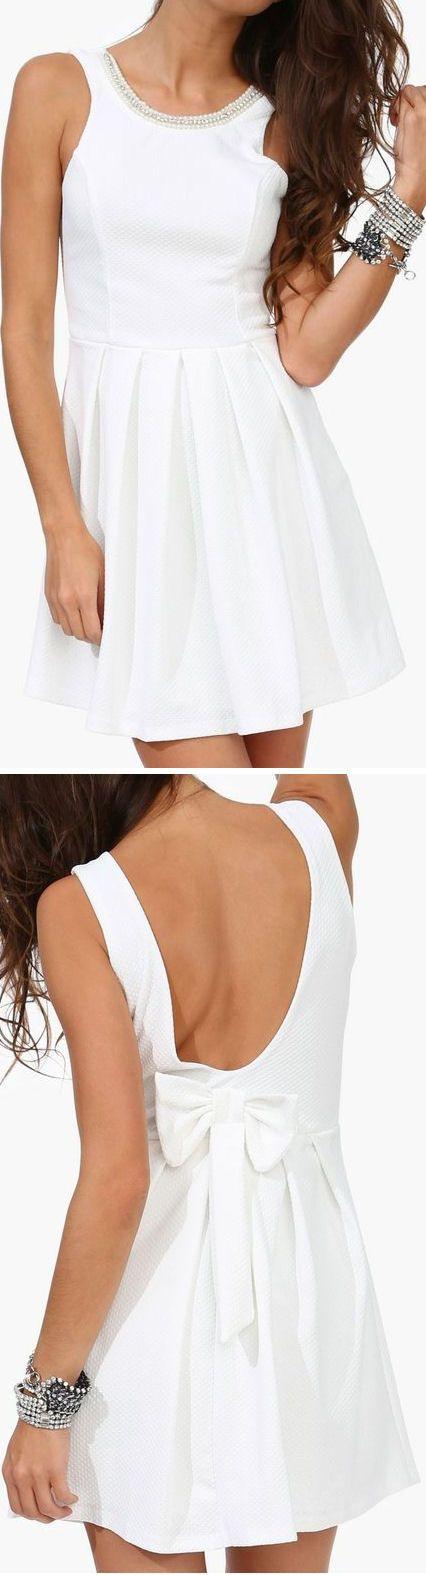 Bejeweled Bow Back Dress ♥